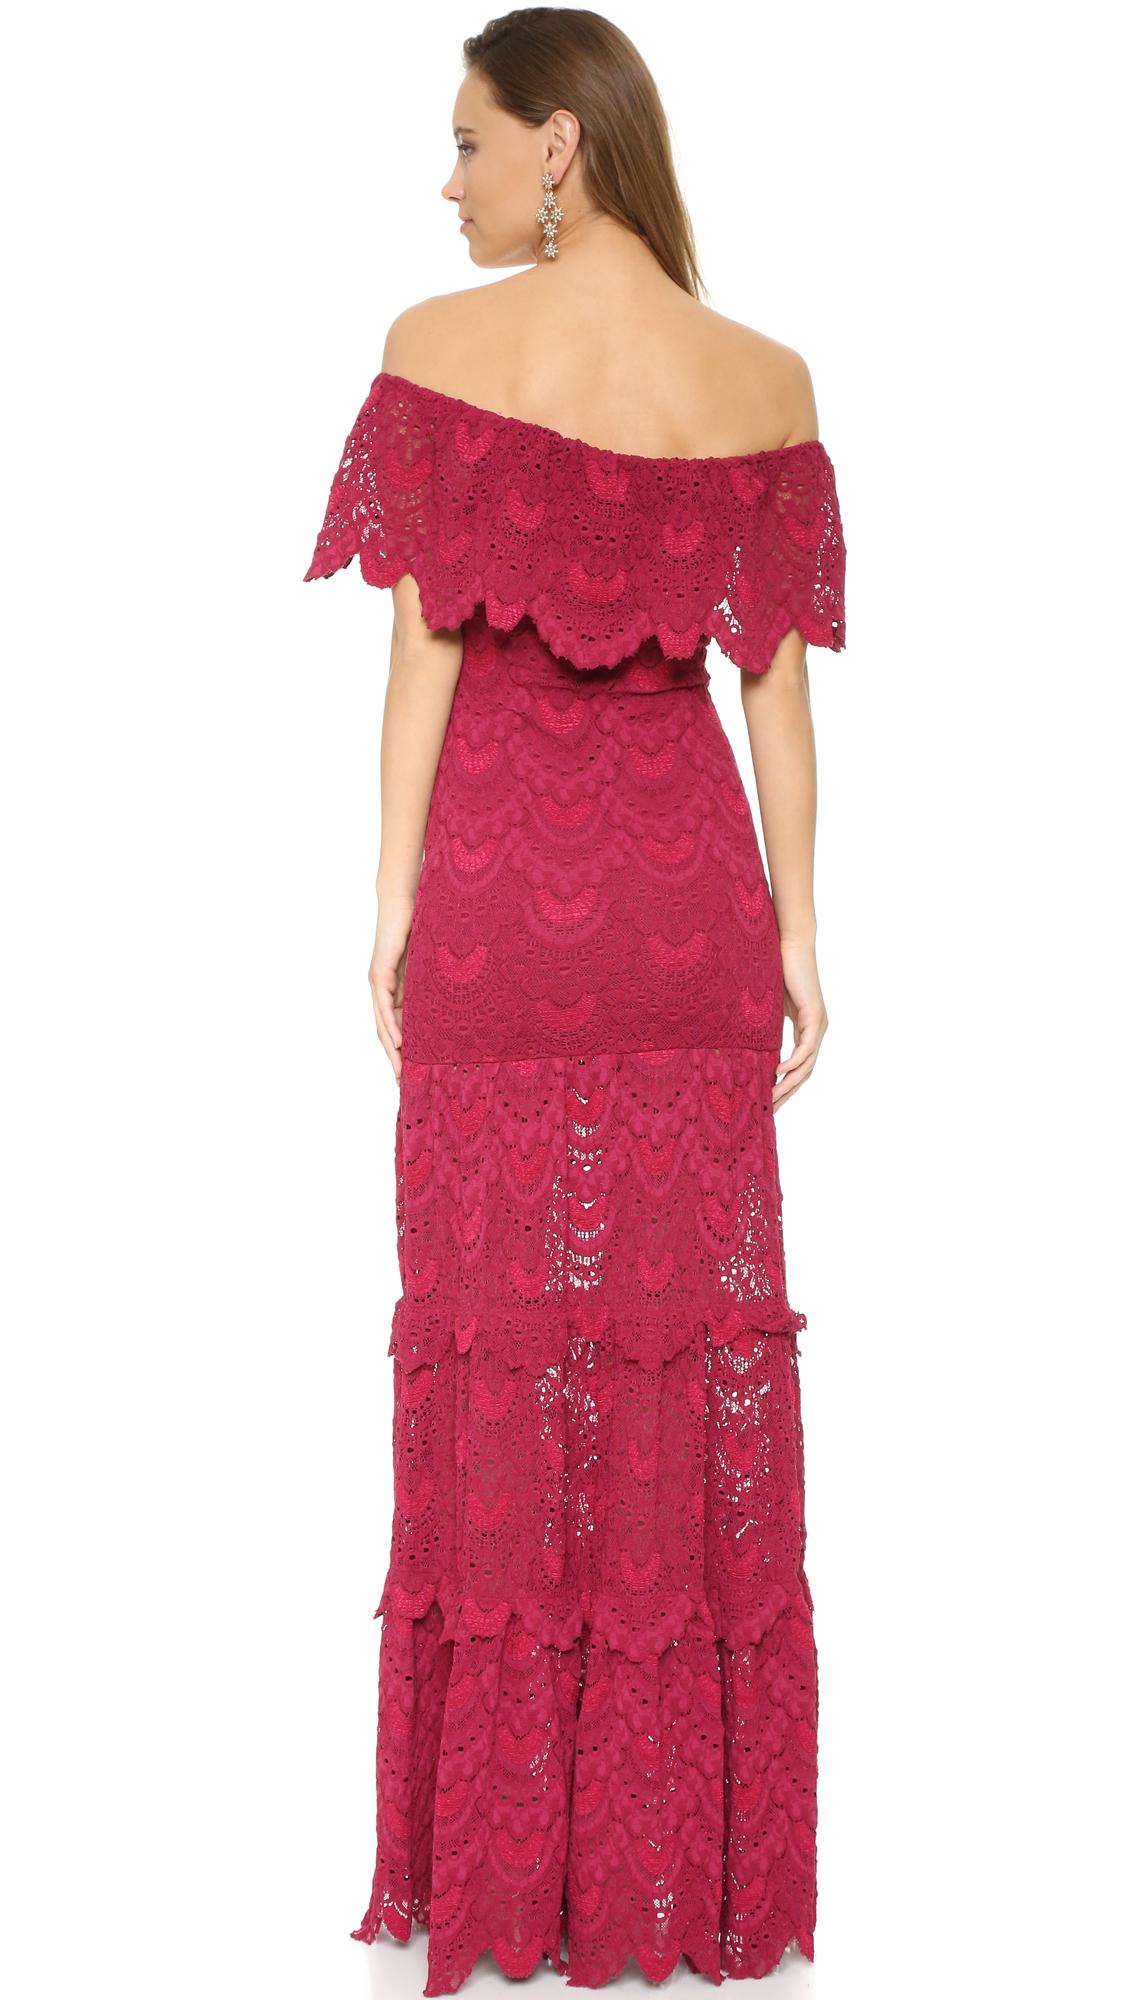 Positano maxi dresses